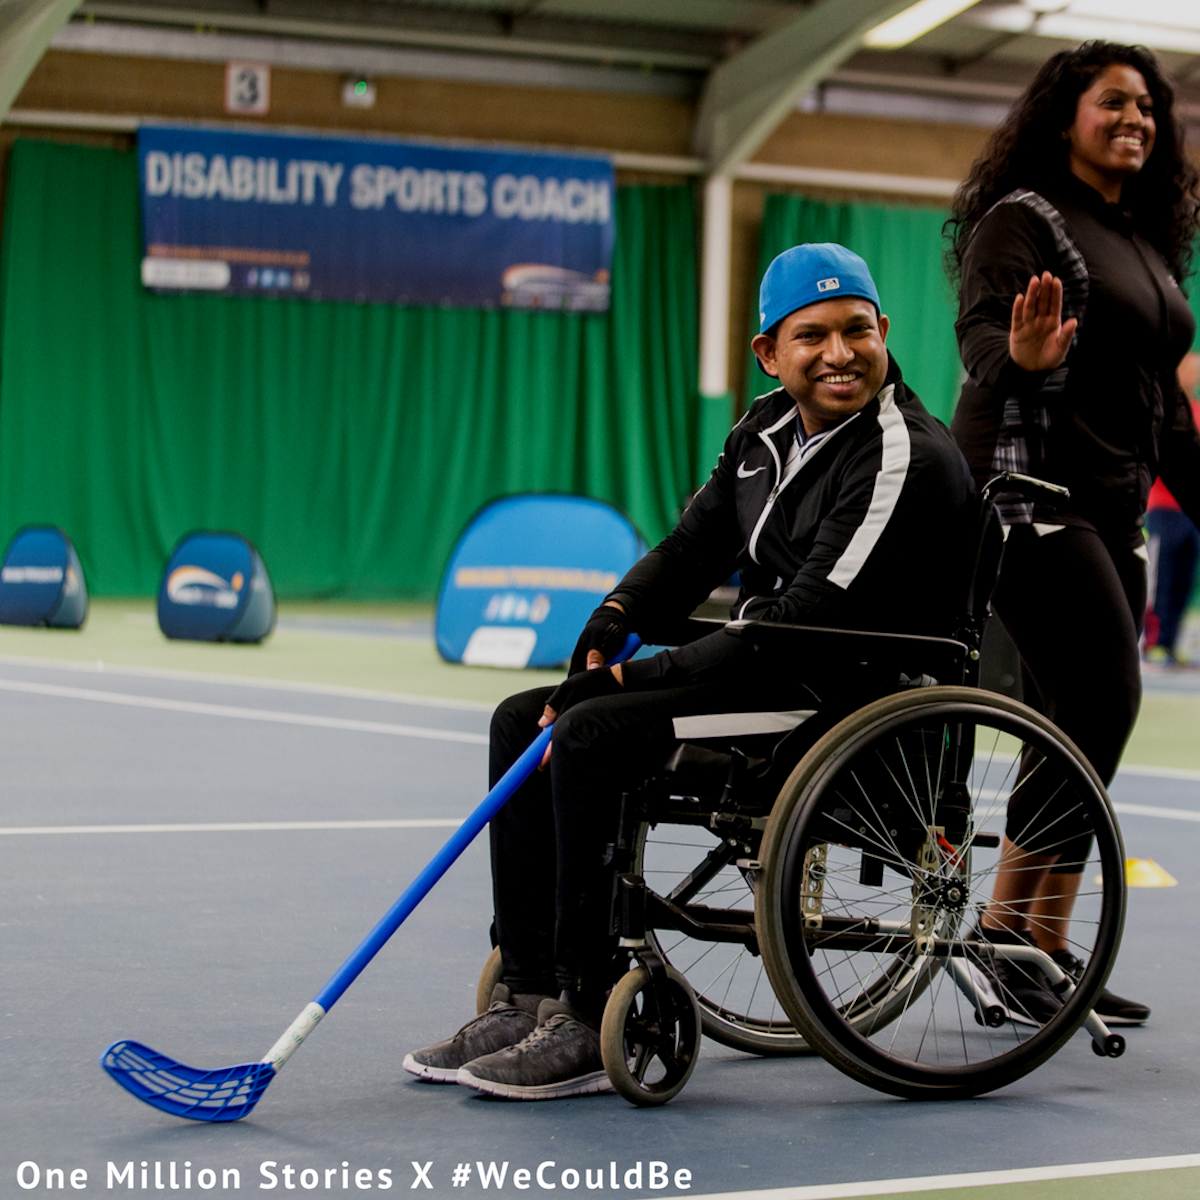 #WeCouldBe X One Million Stories - Ram Varatharajasarma Disability Sports Coach & London Sport